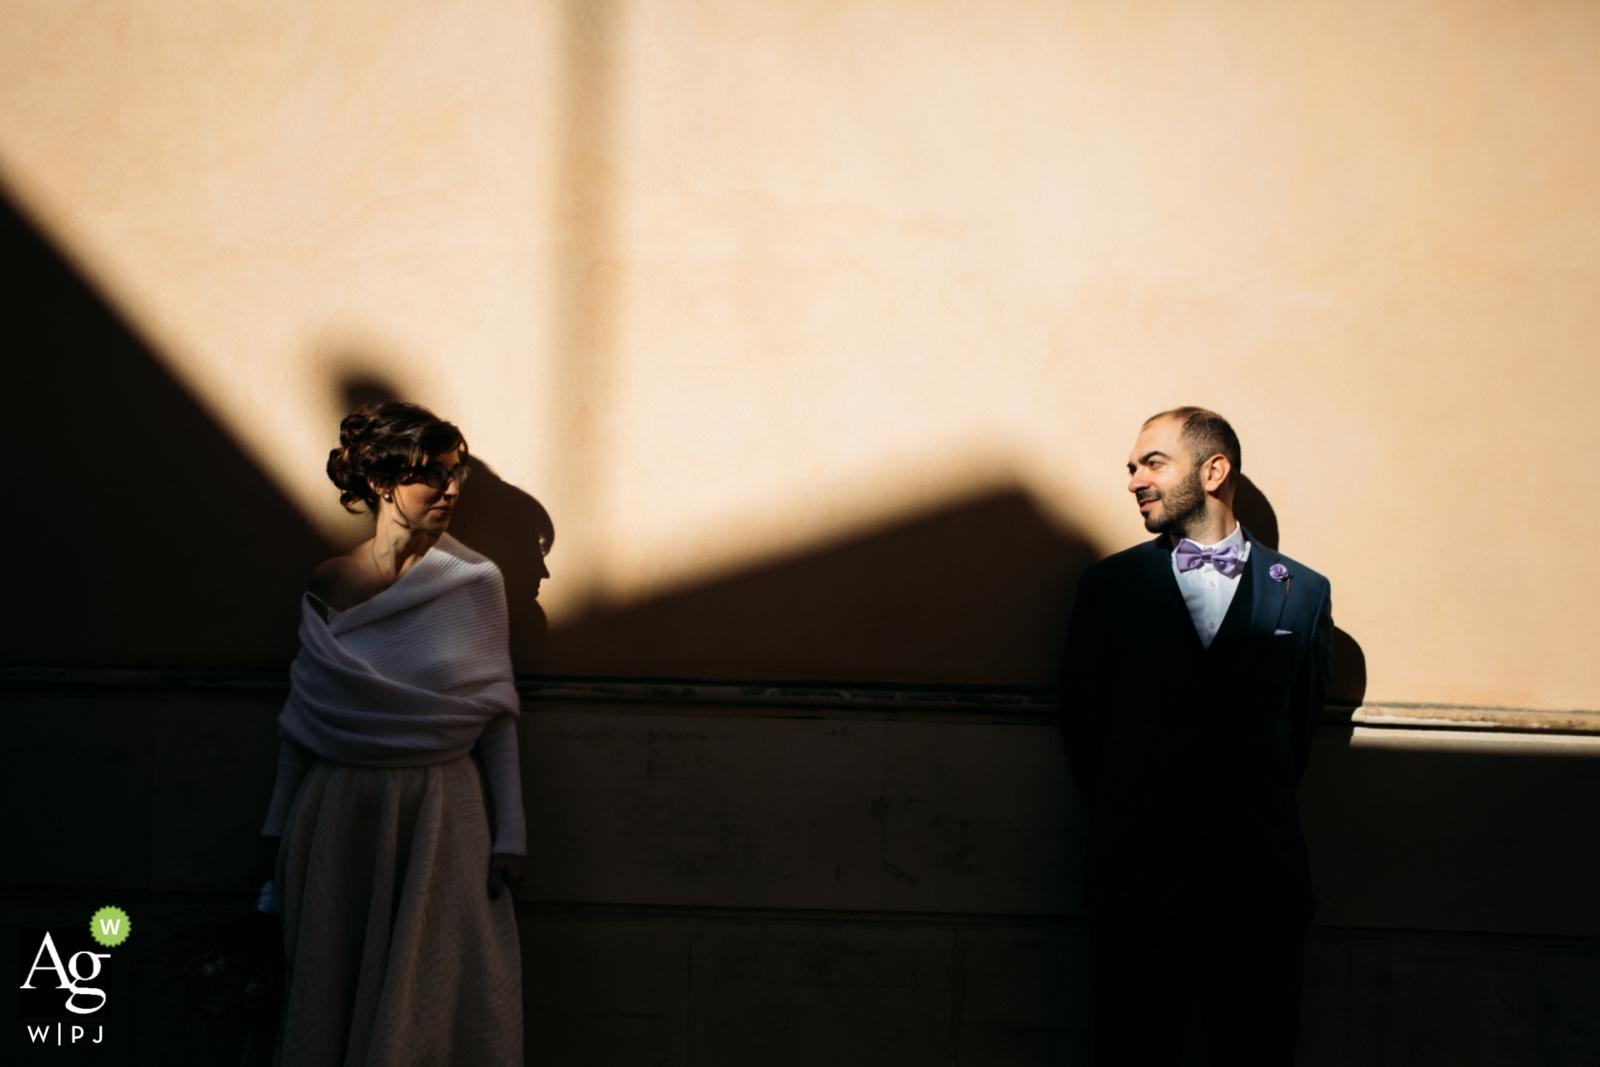 Syracuse, Sicily artistic wedding couple portrait using light and shadow